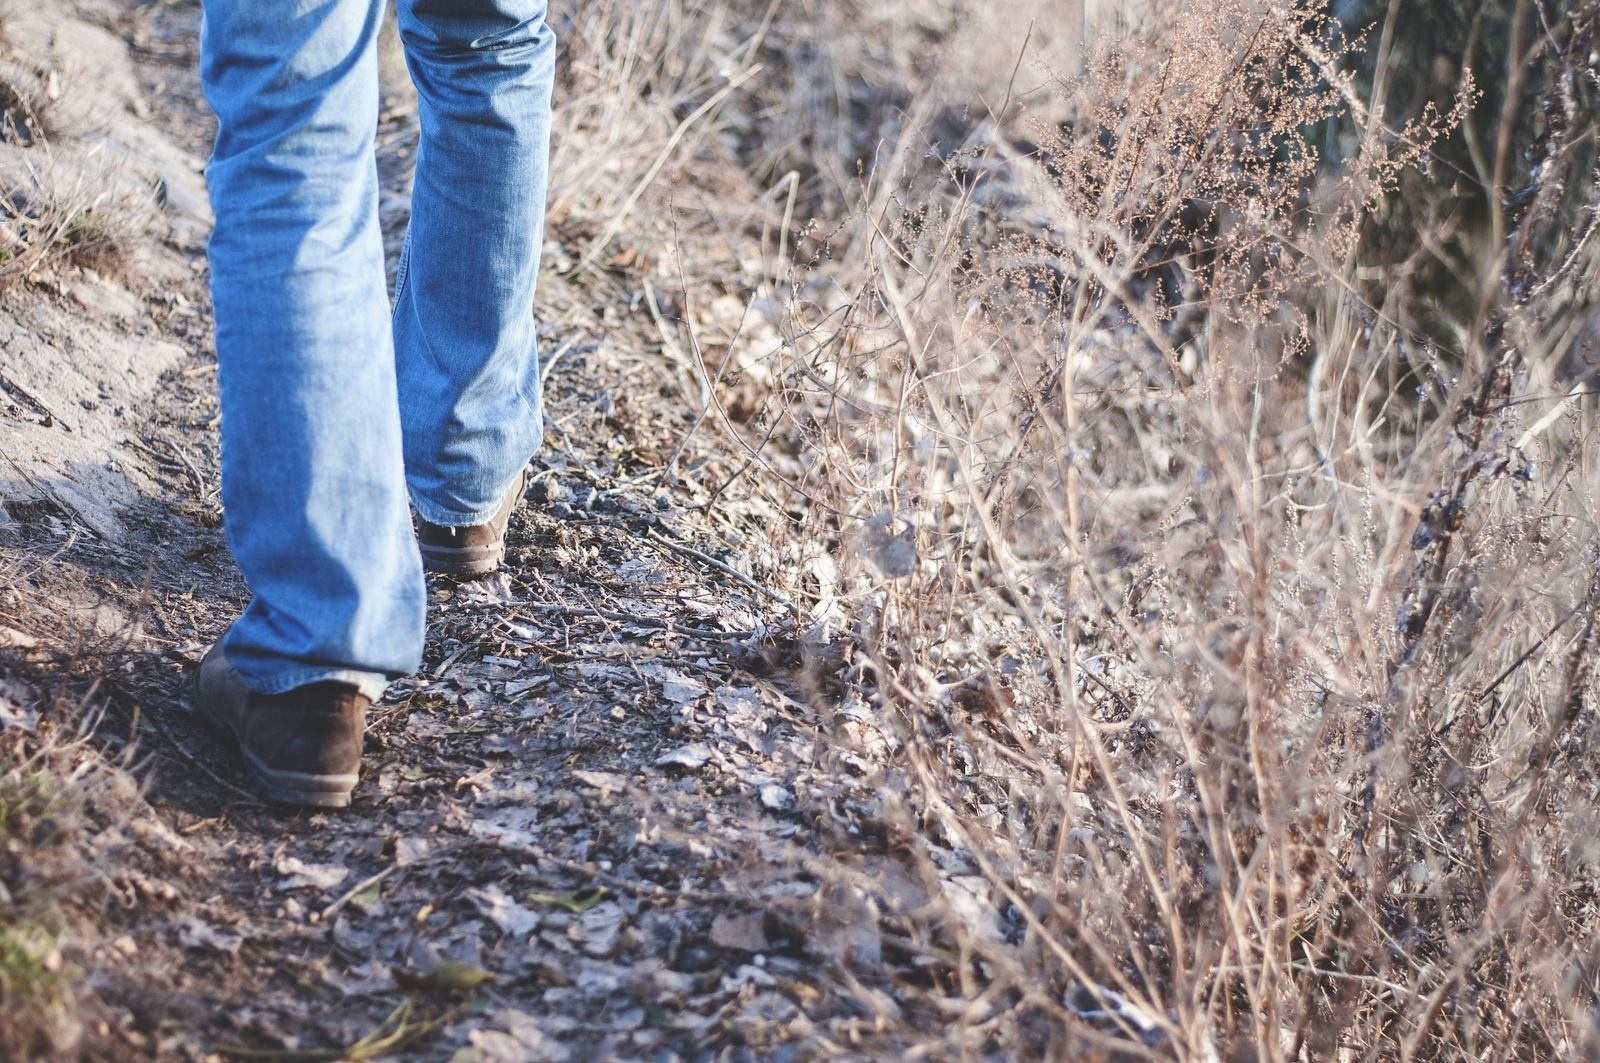 hiking-1149985_1920_wtwrr